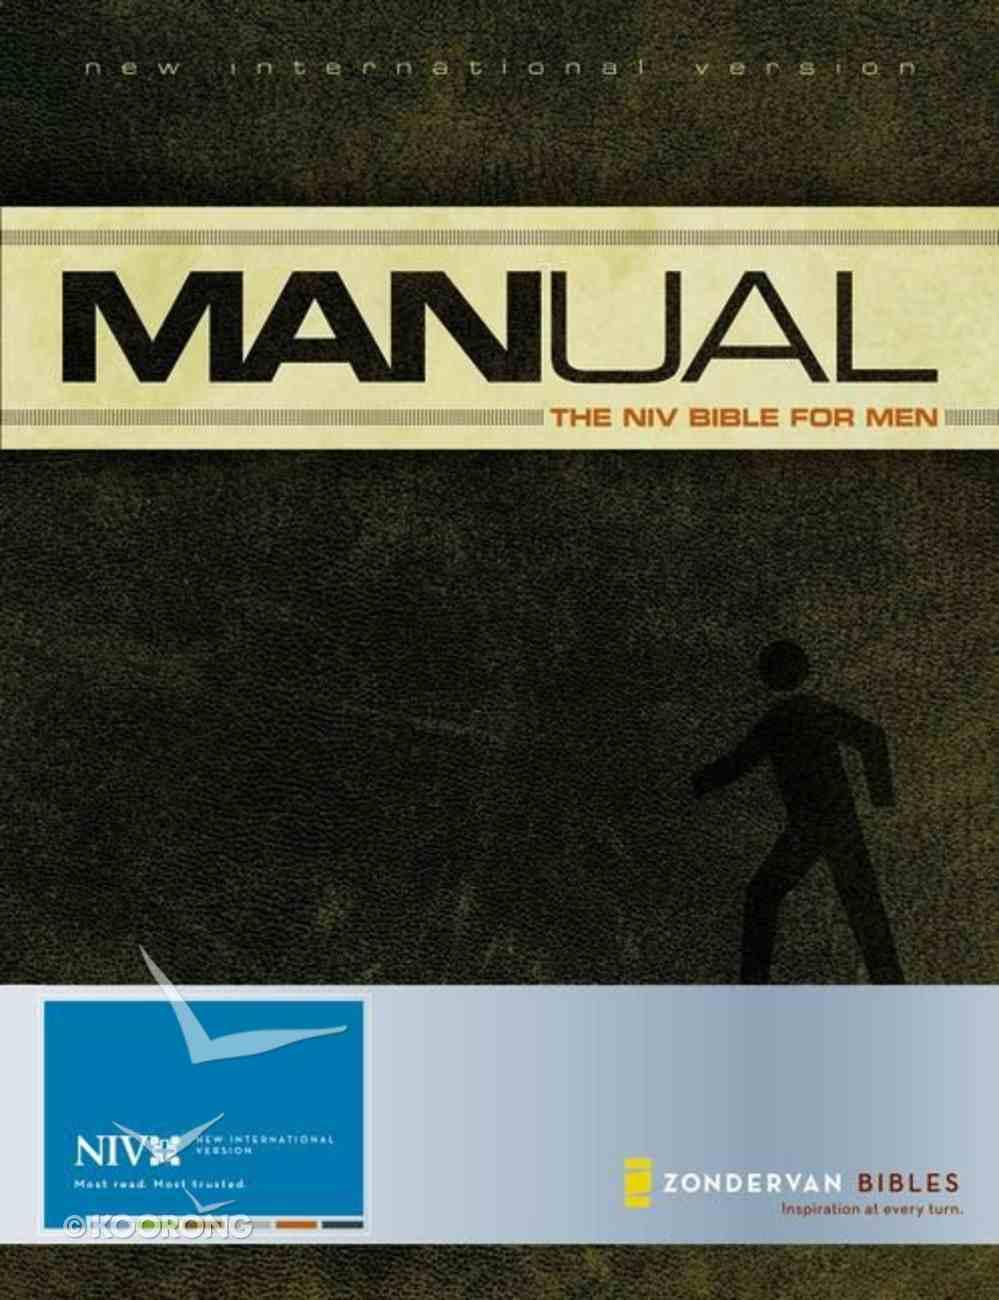 NIV Manual Bible For Men (1984) Hardback